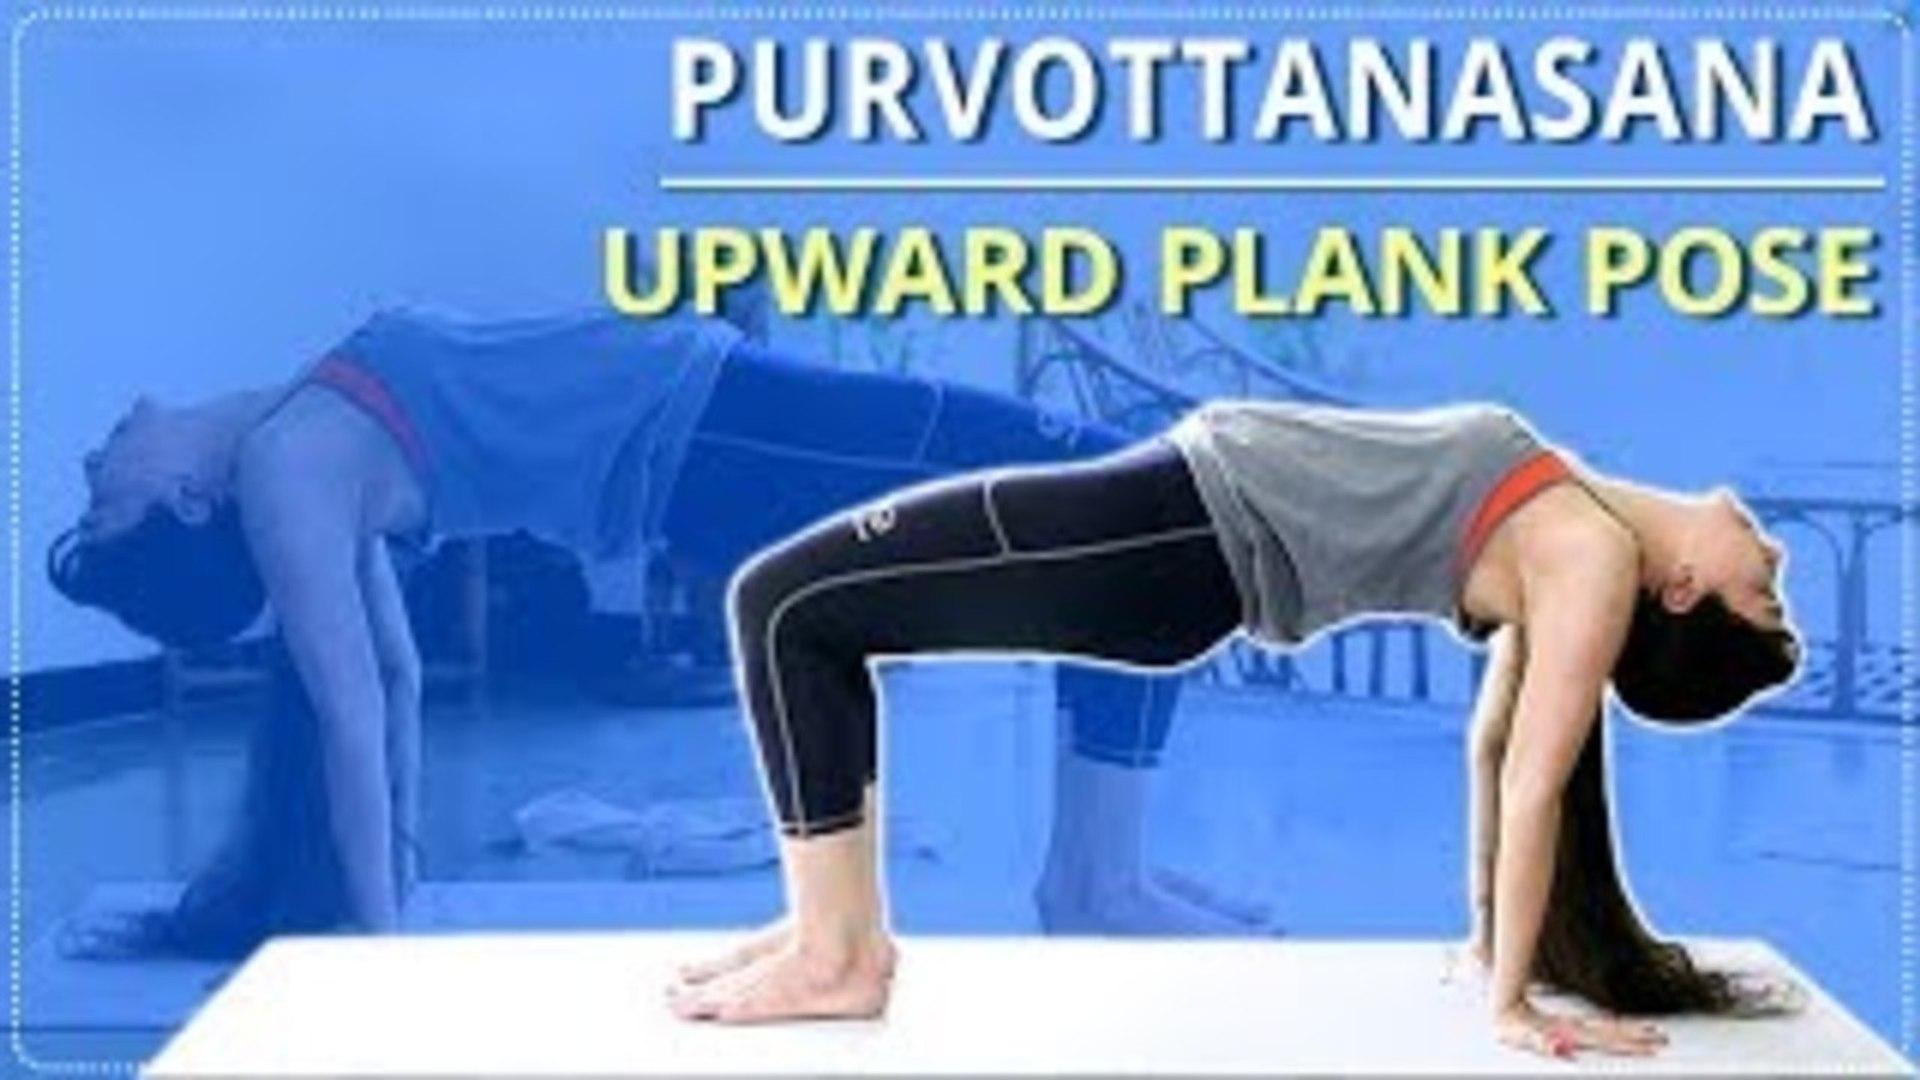 Learn The Upward Plank Pose | Purvottanasana |Simple Yoga For Beginners |Mind Body Soul